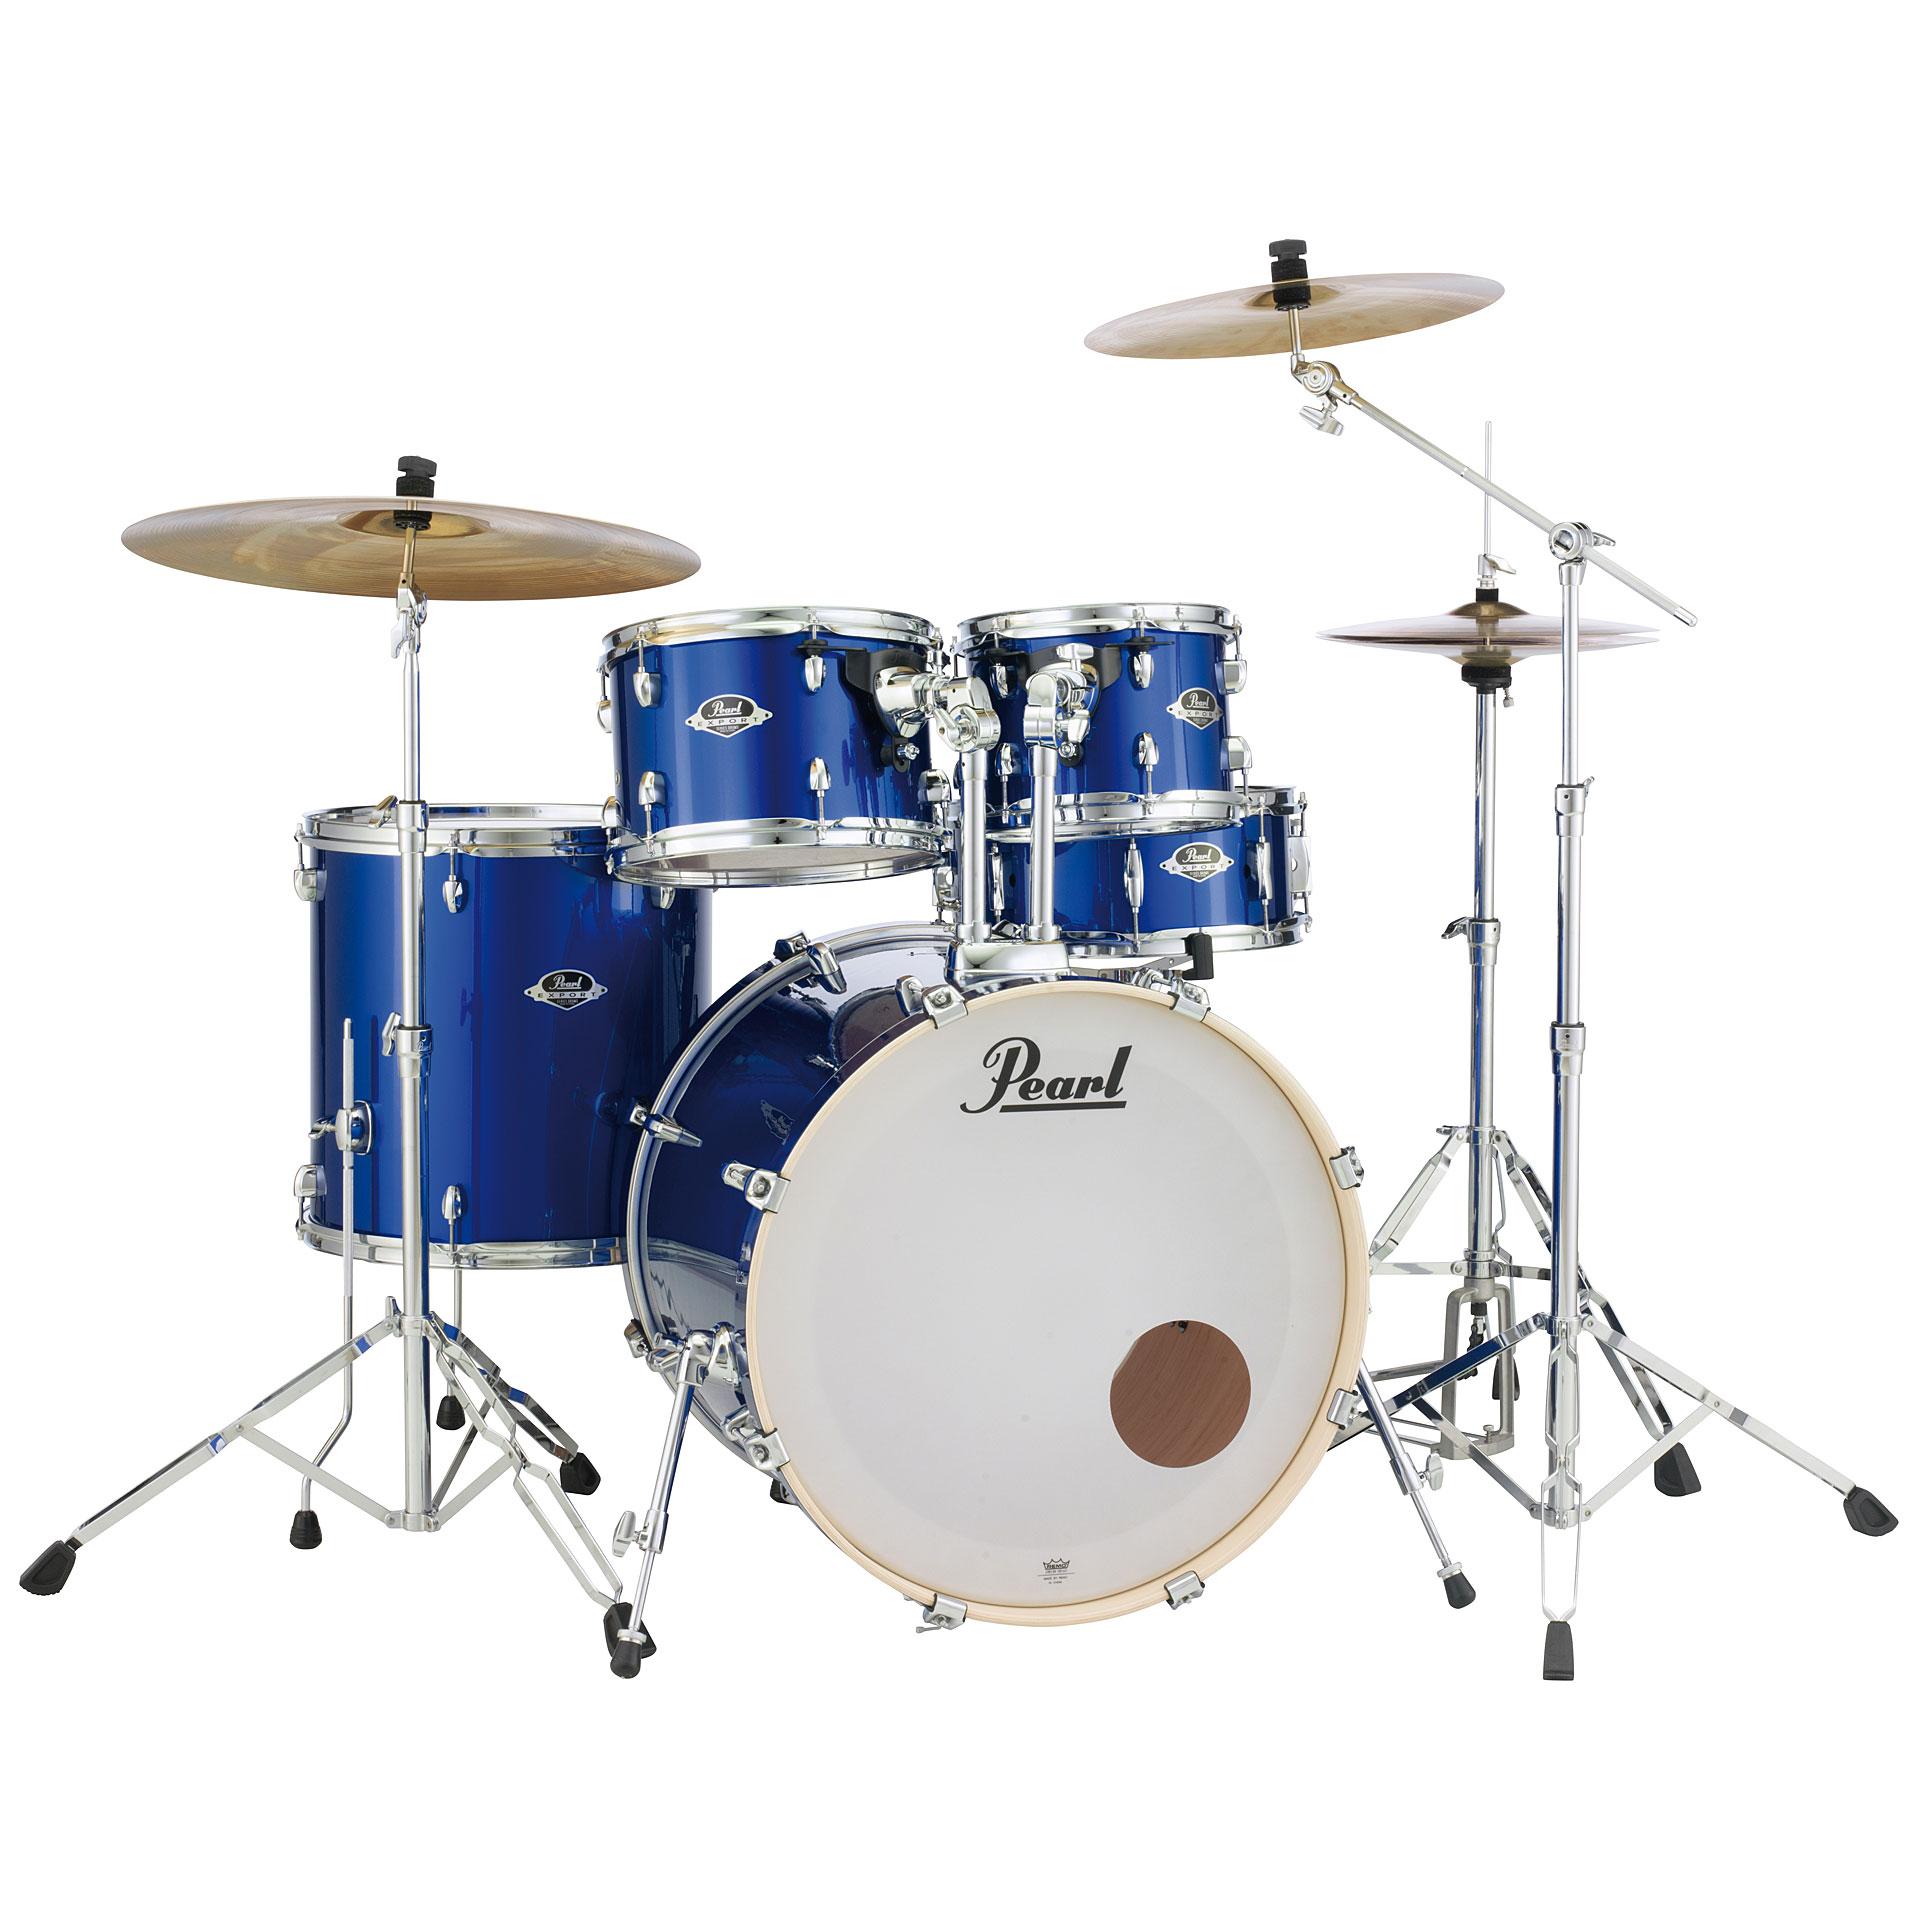 High Voltage Drummer : Pearl export quot high voltage blue complete drumset « drum kit